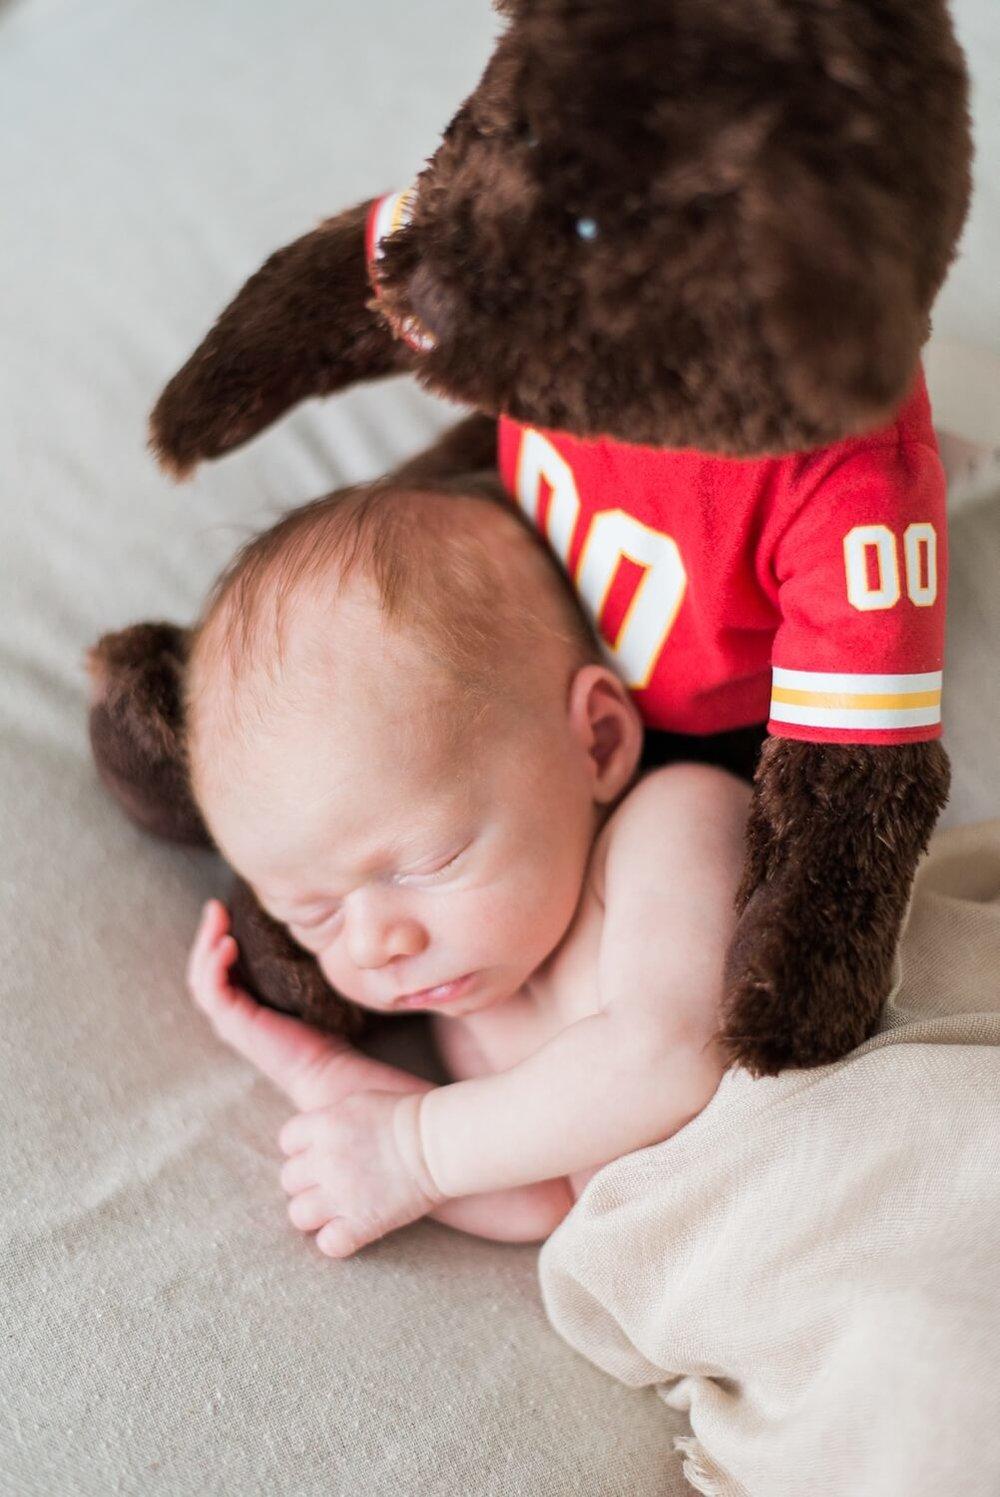 best-portland-oregon-newborn-photographer-sleeping-baby-boy-with-bear-shelley-marie-photography-88.jpg